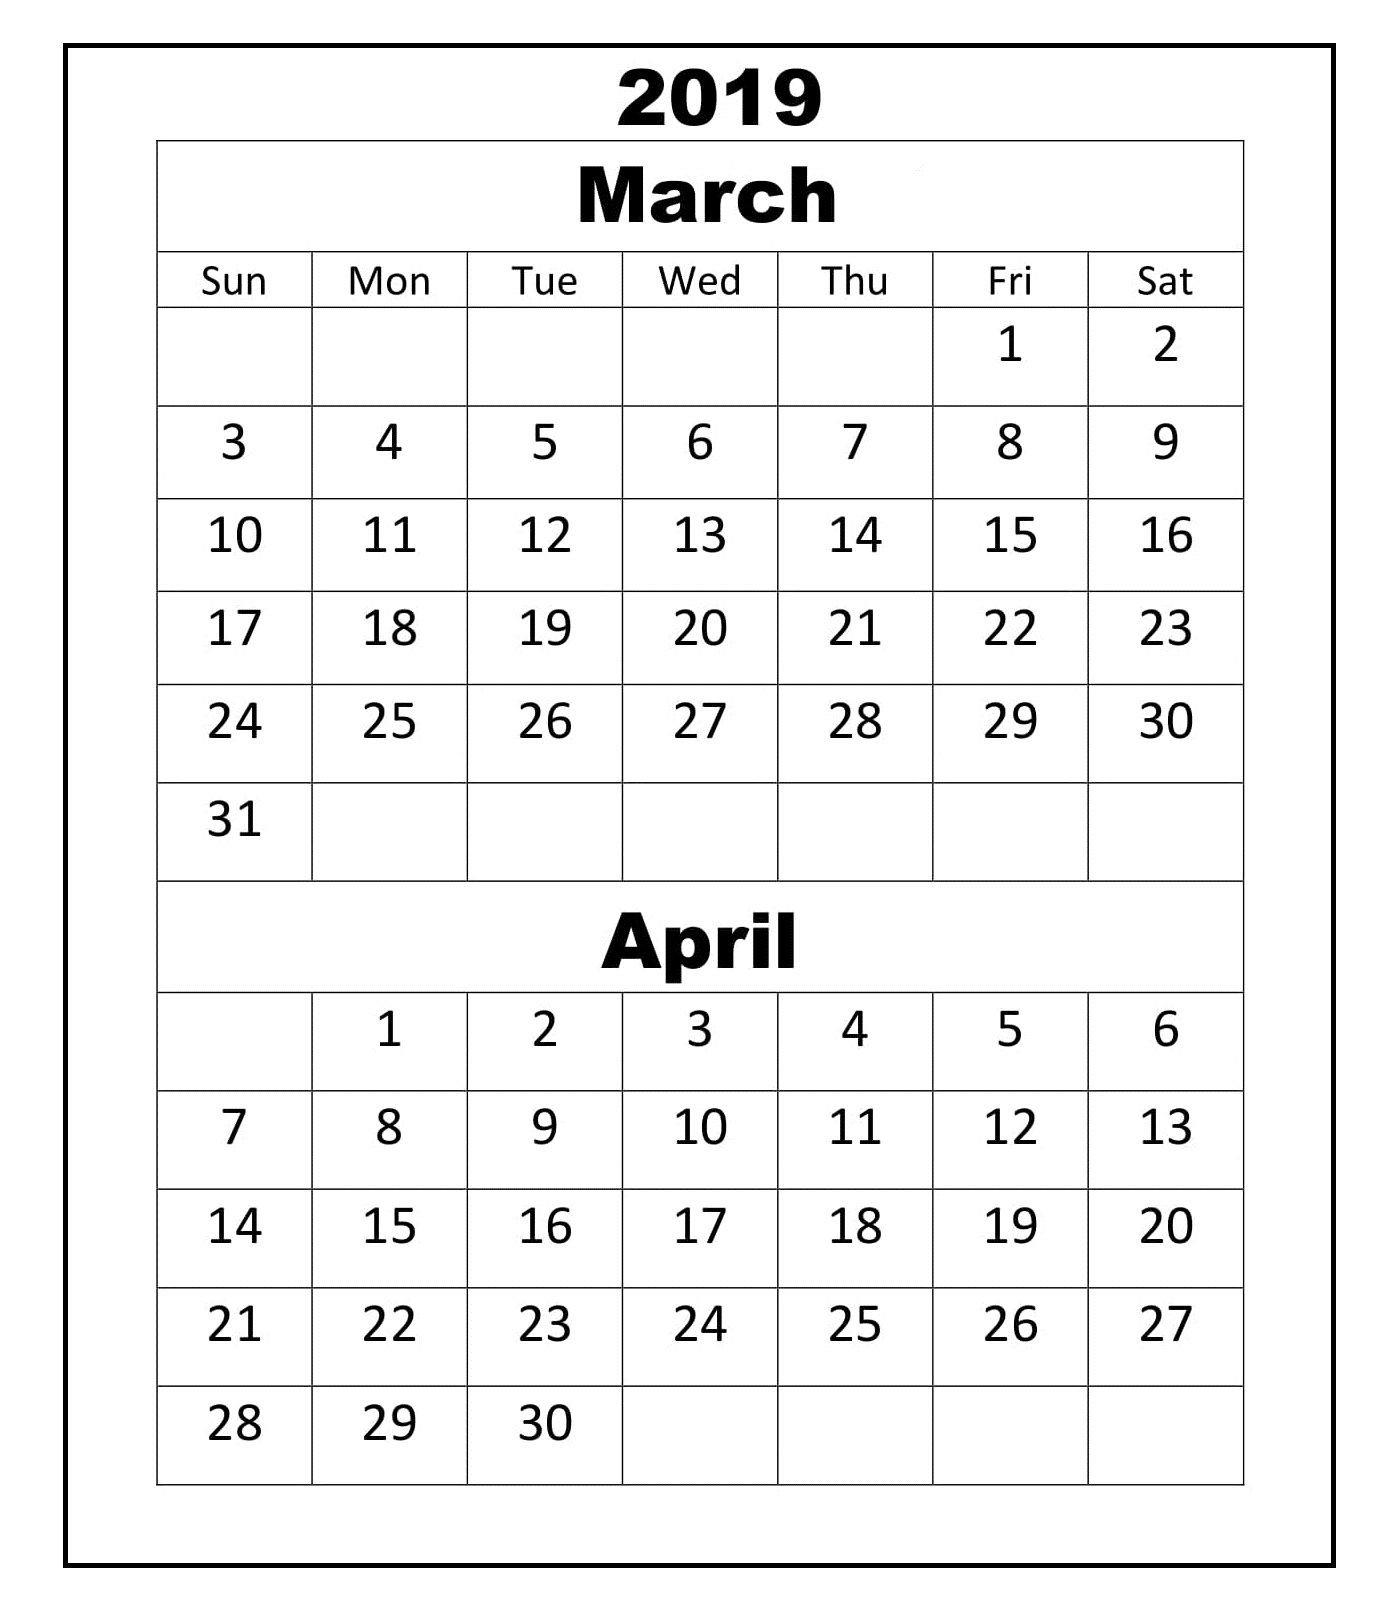 March April 2019 Calendar Academic   March April 2019 Calendar For Calendar 2019 March April